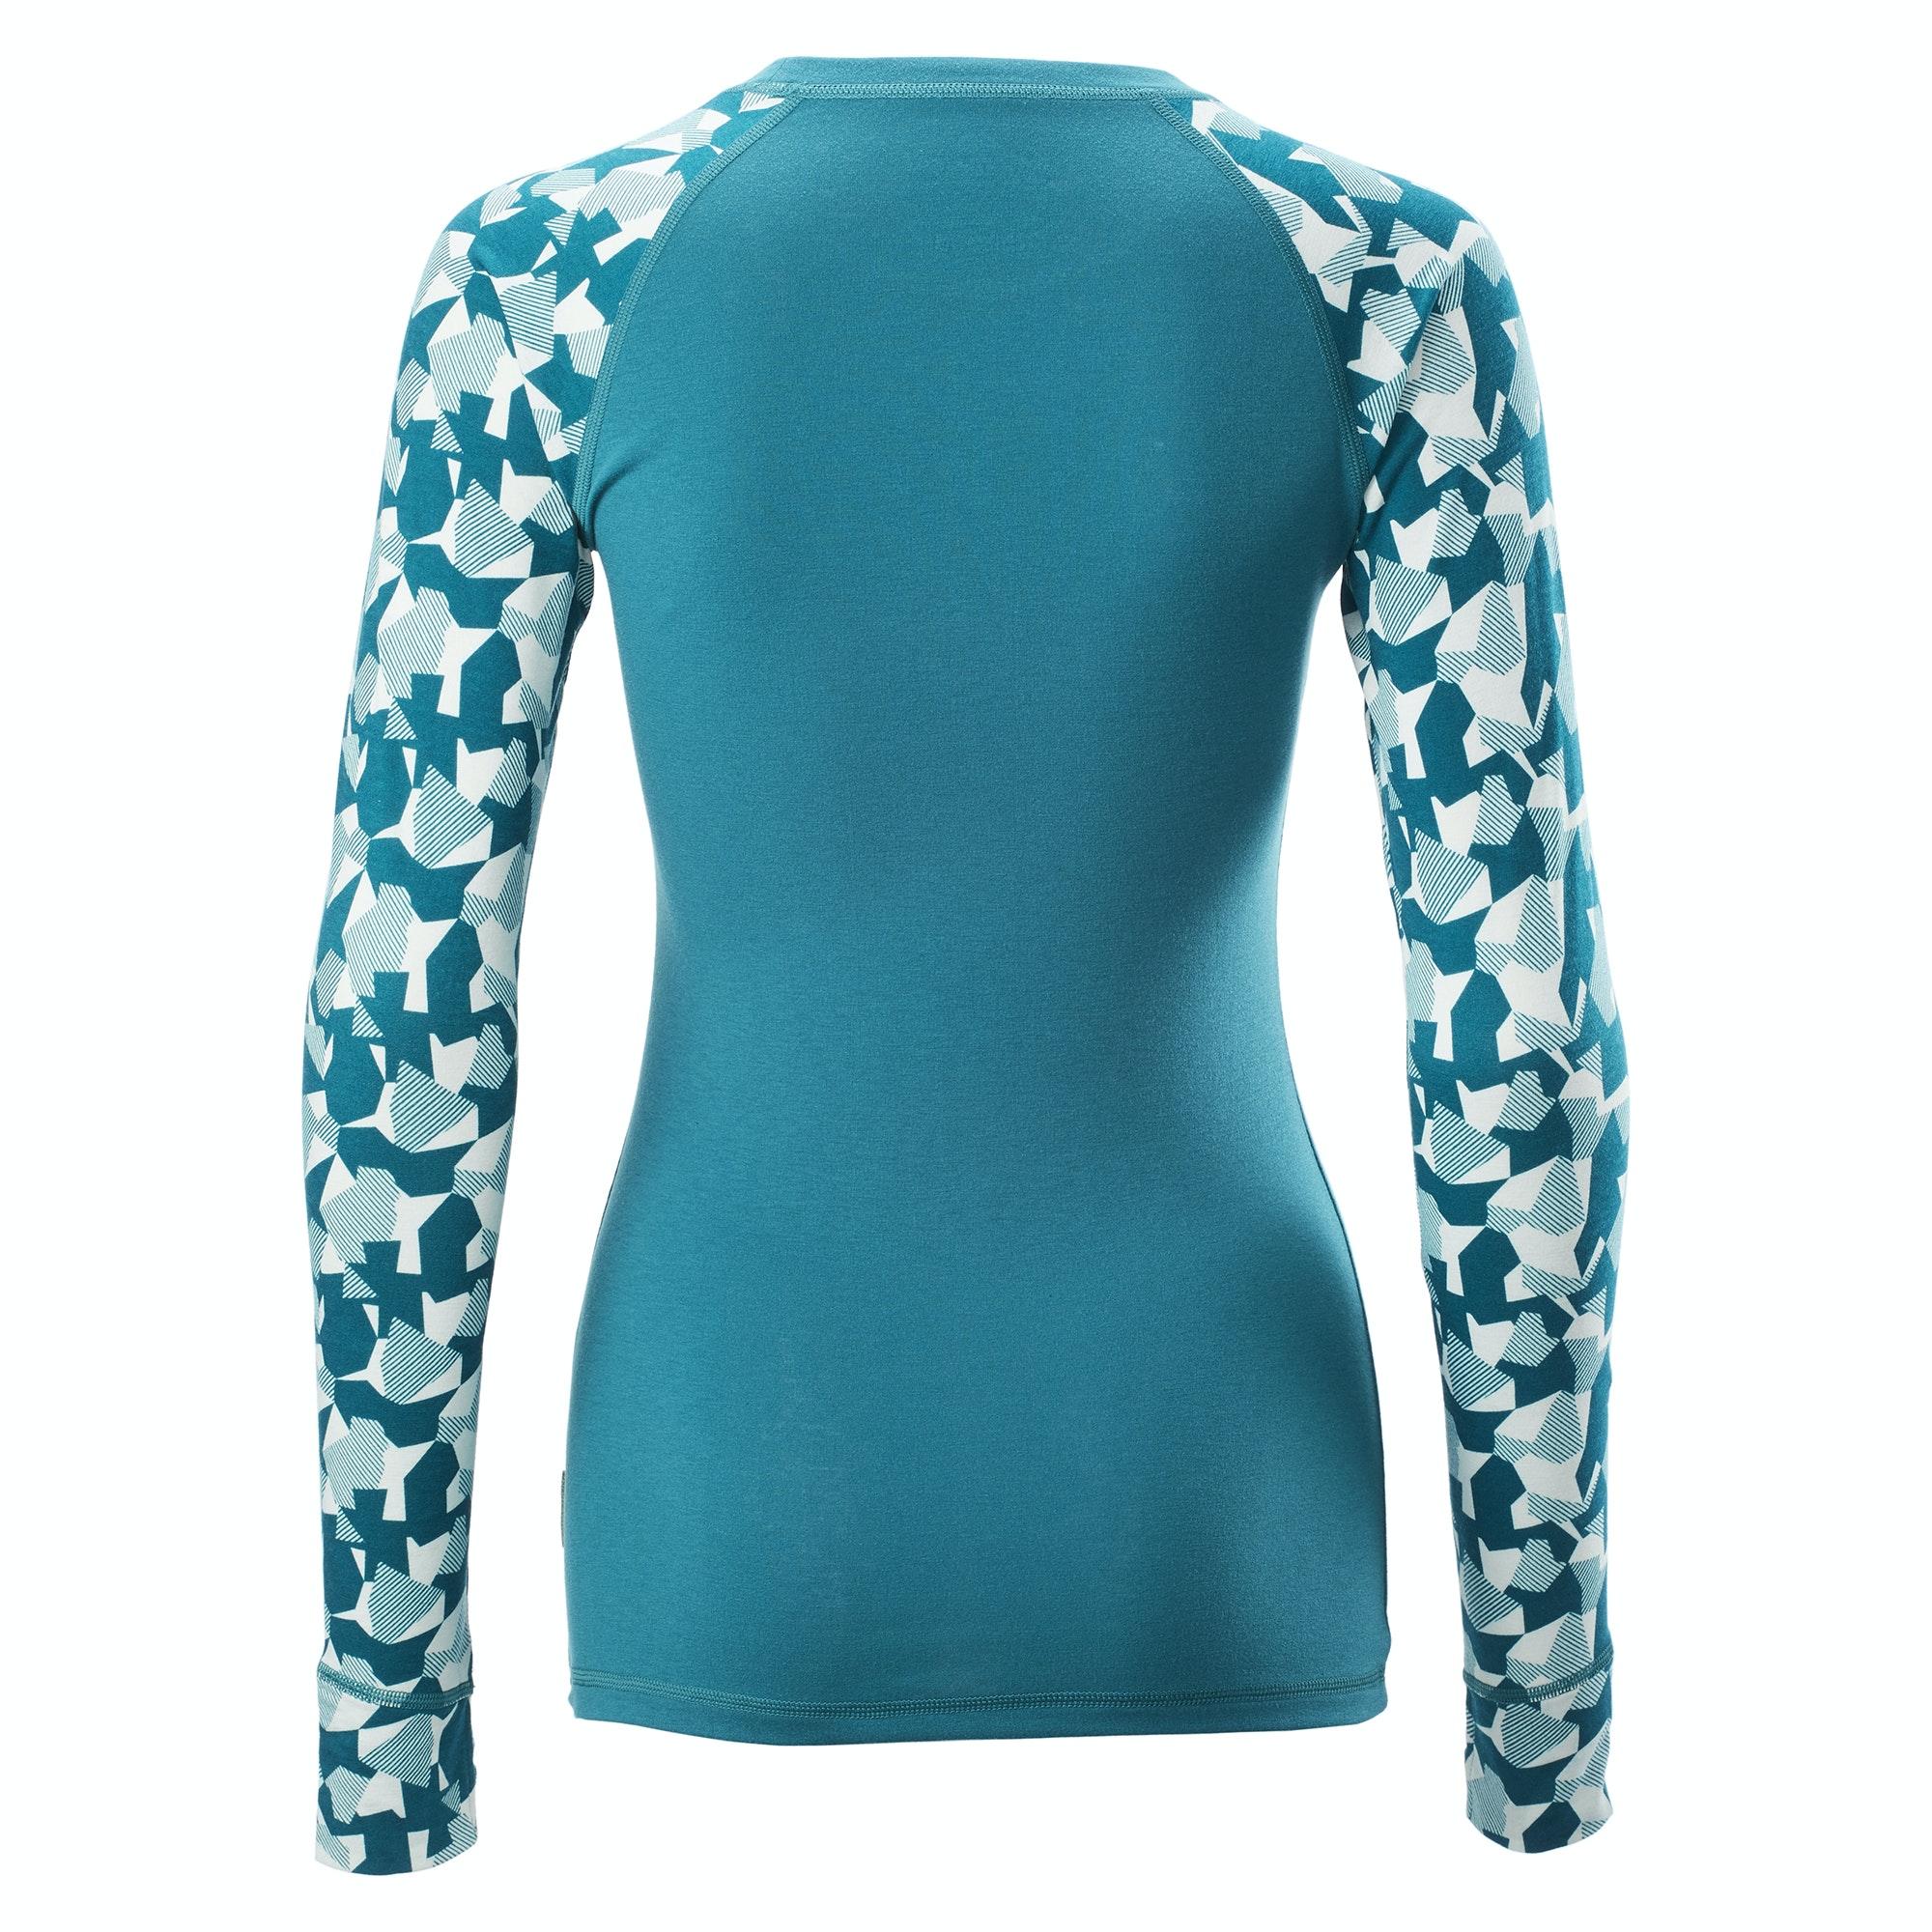 thumbnail 12 - NEW Kathmandu KMDMotion Womens Long Sleeve Thermal Base Layer Warm Breathable